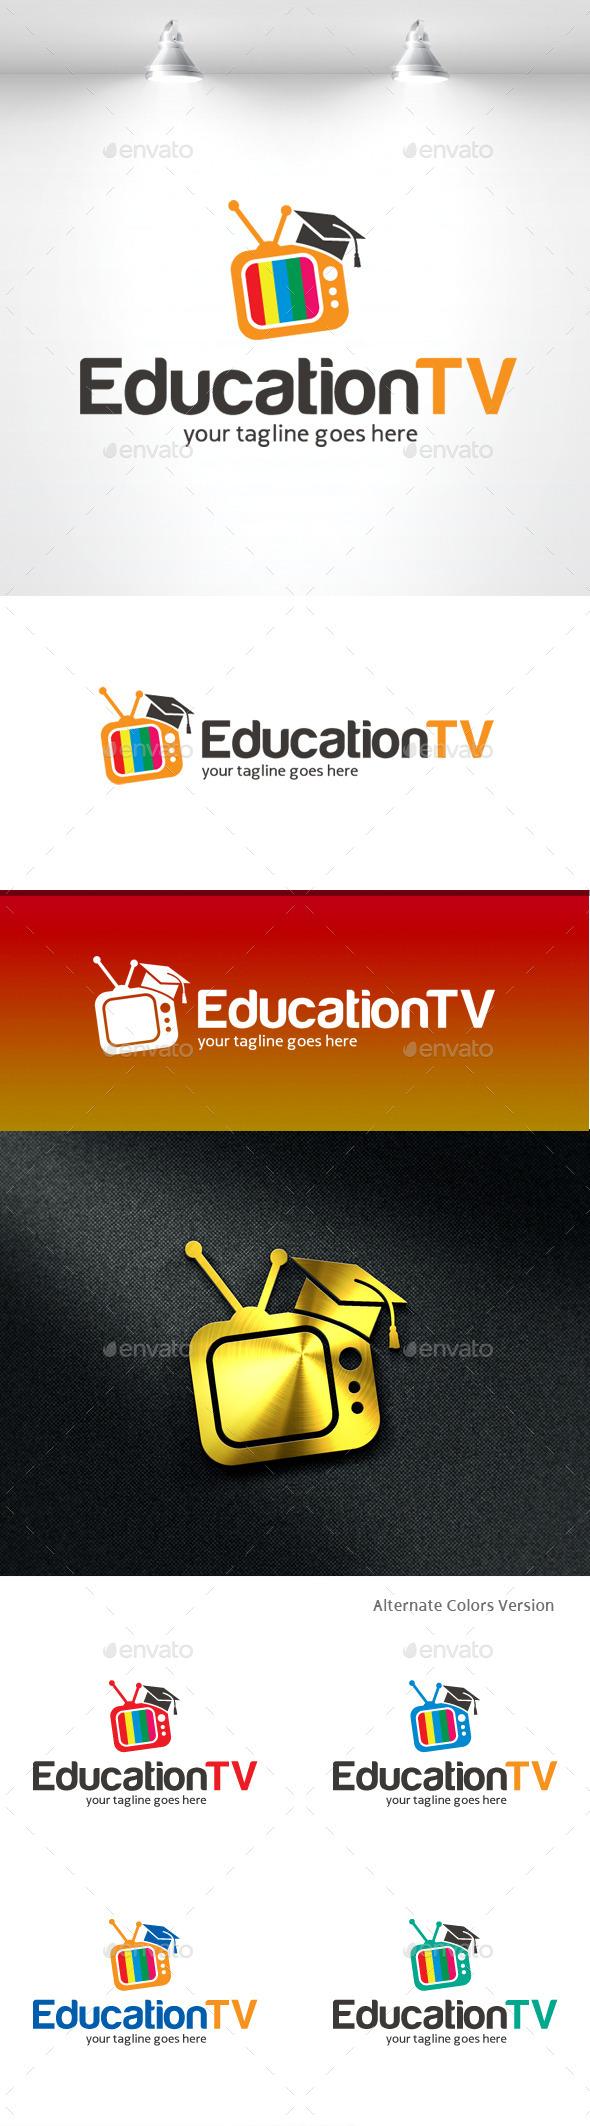 Education TV Logo